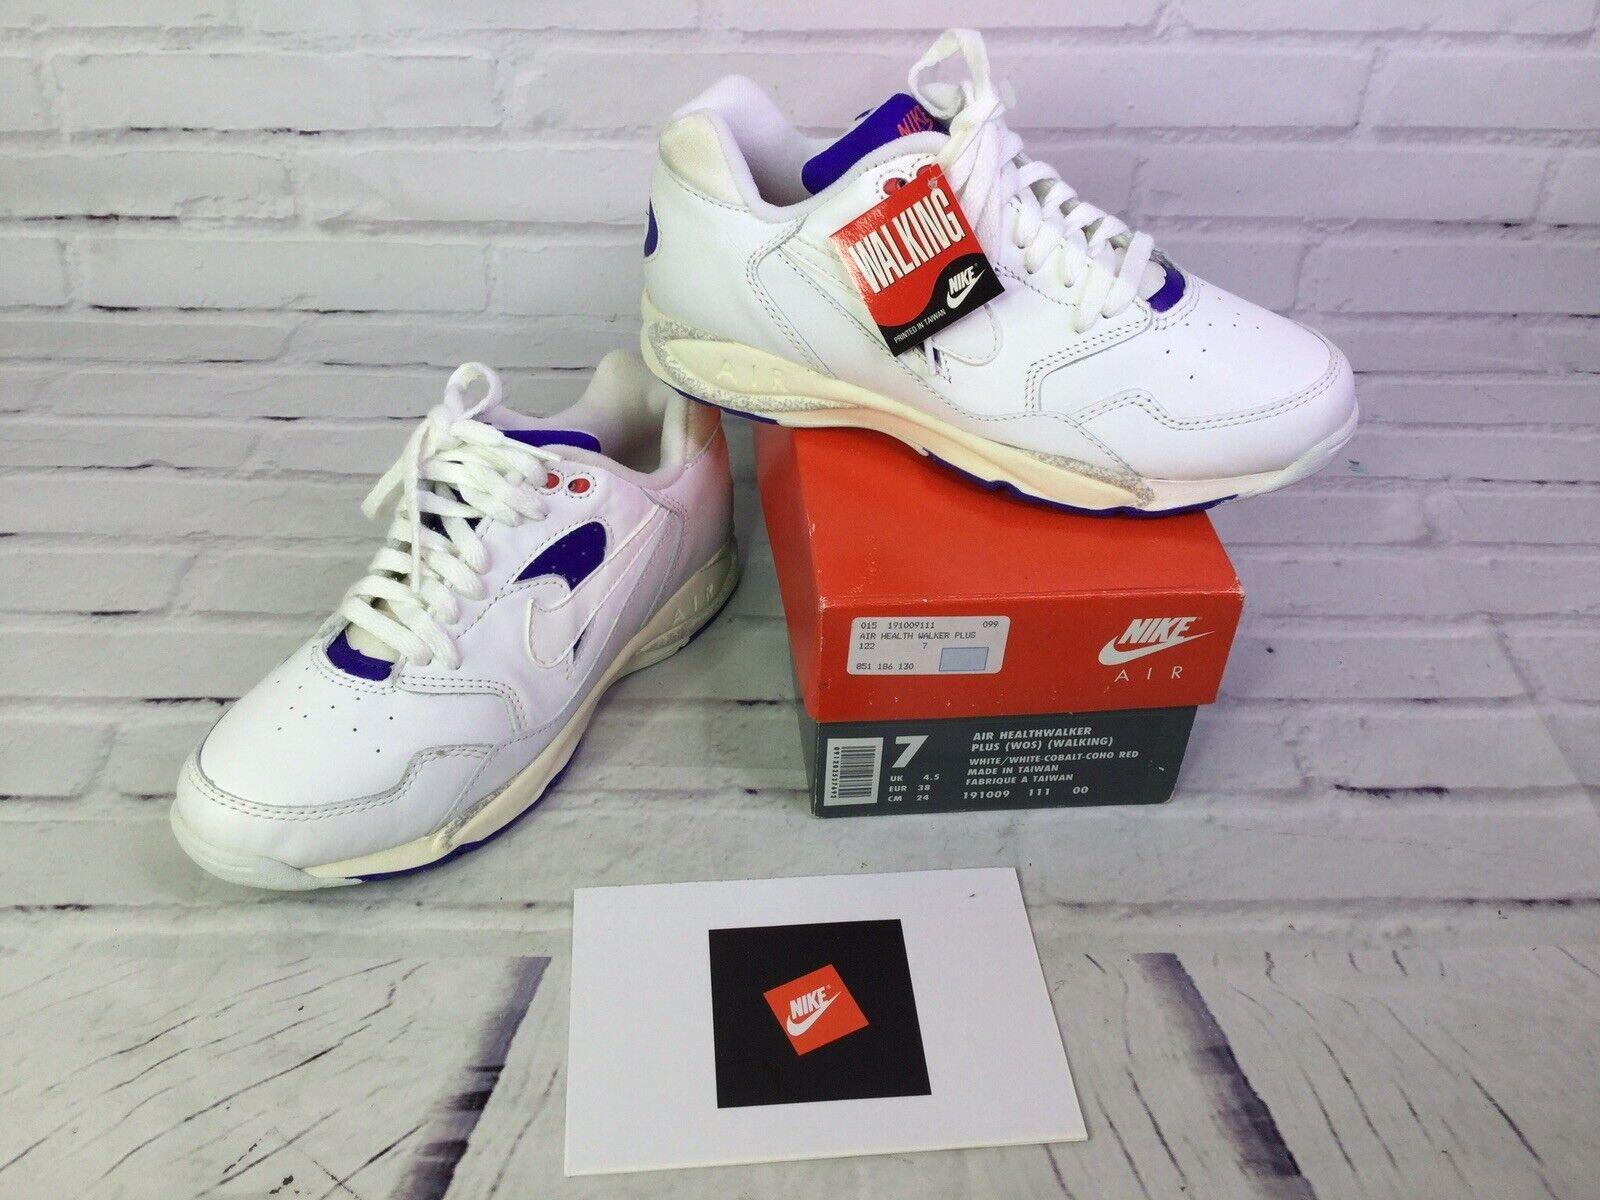 Nike Air Healthwalker Plus Walking White Cobolt Sneaker shoes Womens 7 DEAD STOCK